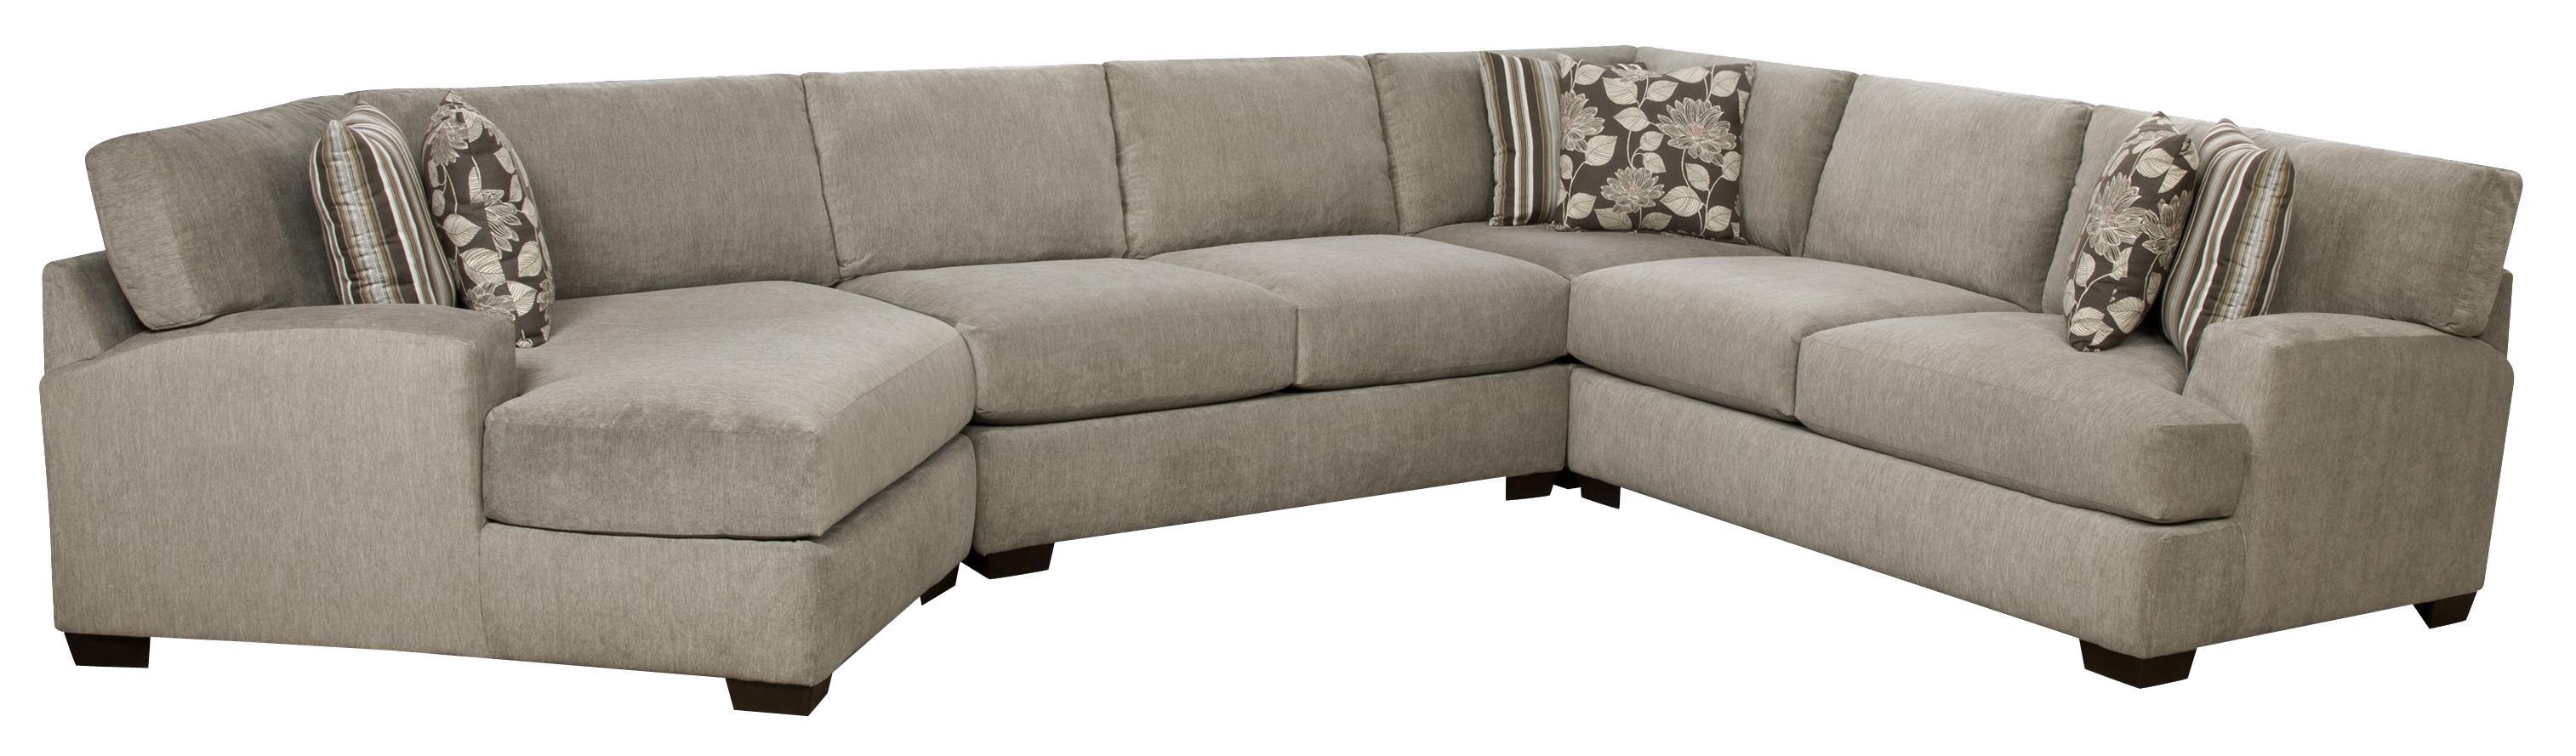 Corinthian Josephine Josephine 4 Piece Sectional Sofa   Great American Home  Store   Sectional Sofas